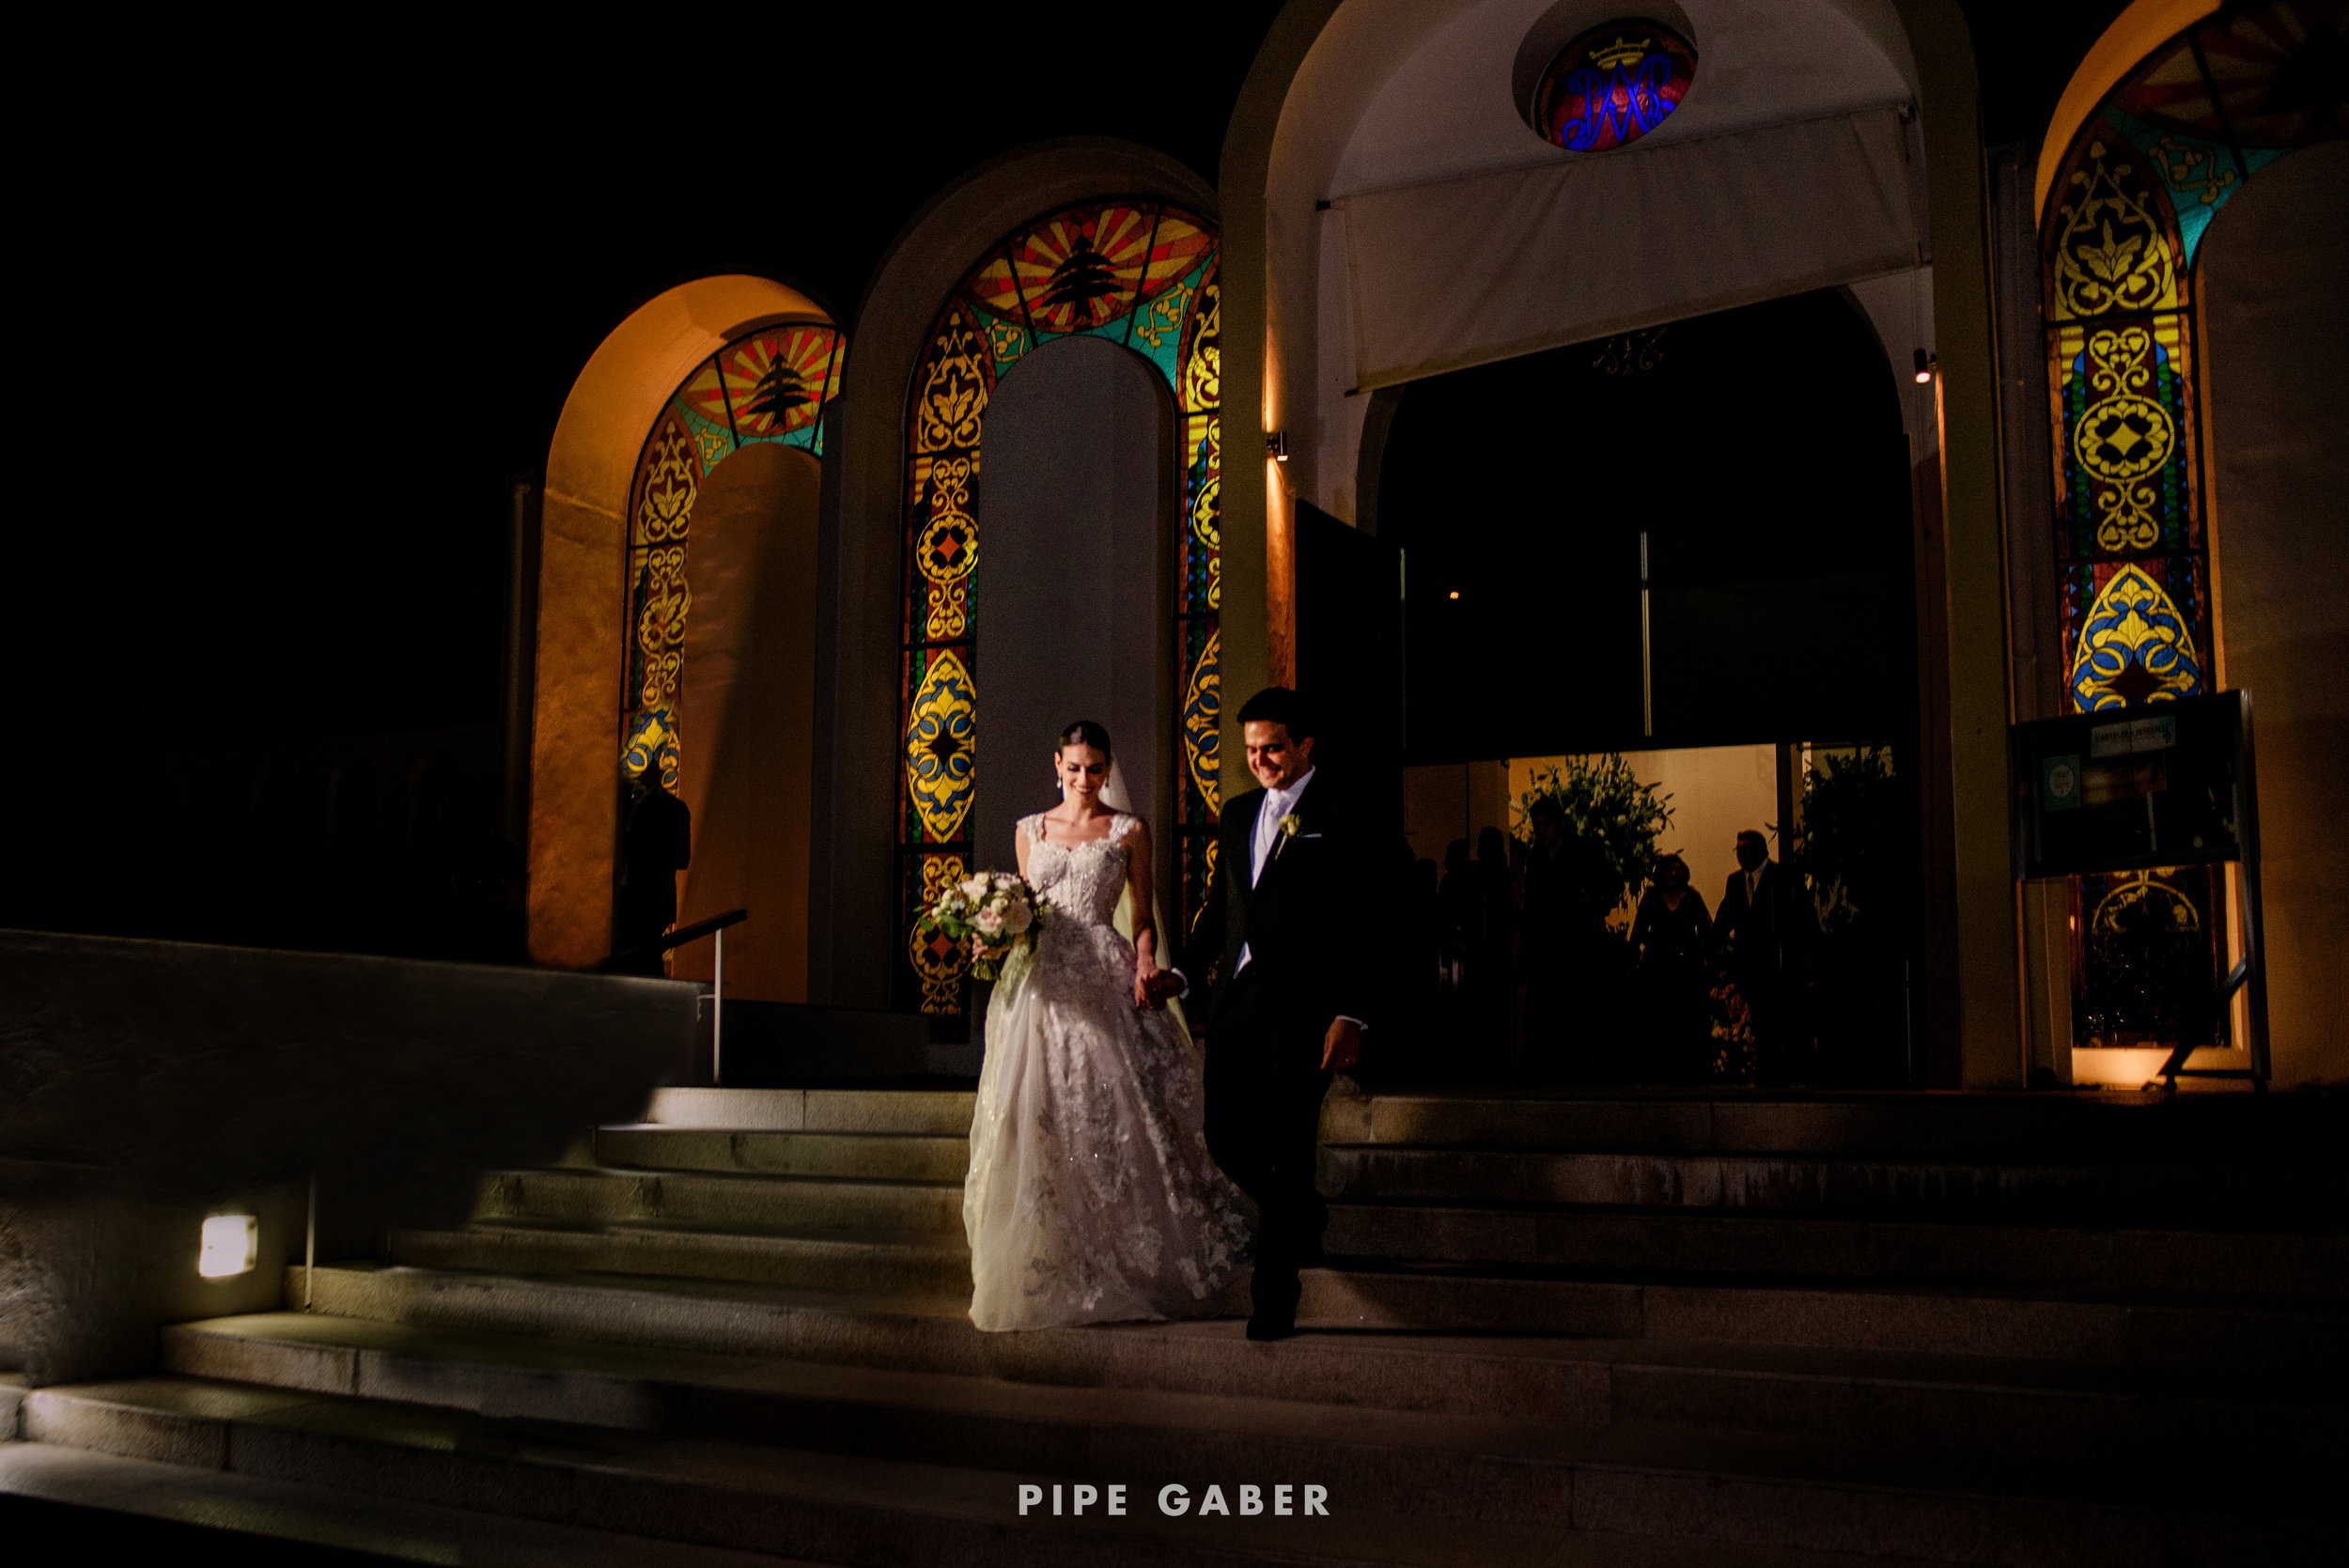 18_02_03_WEDDING_ALEXIS_ABIMERHI_ERICK_APT_2034.jpg